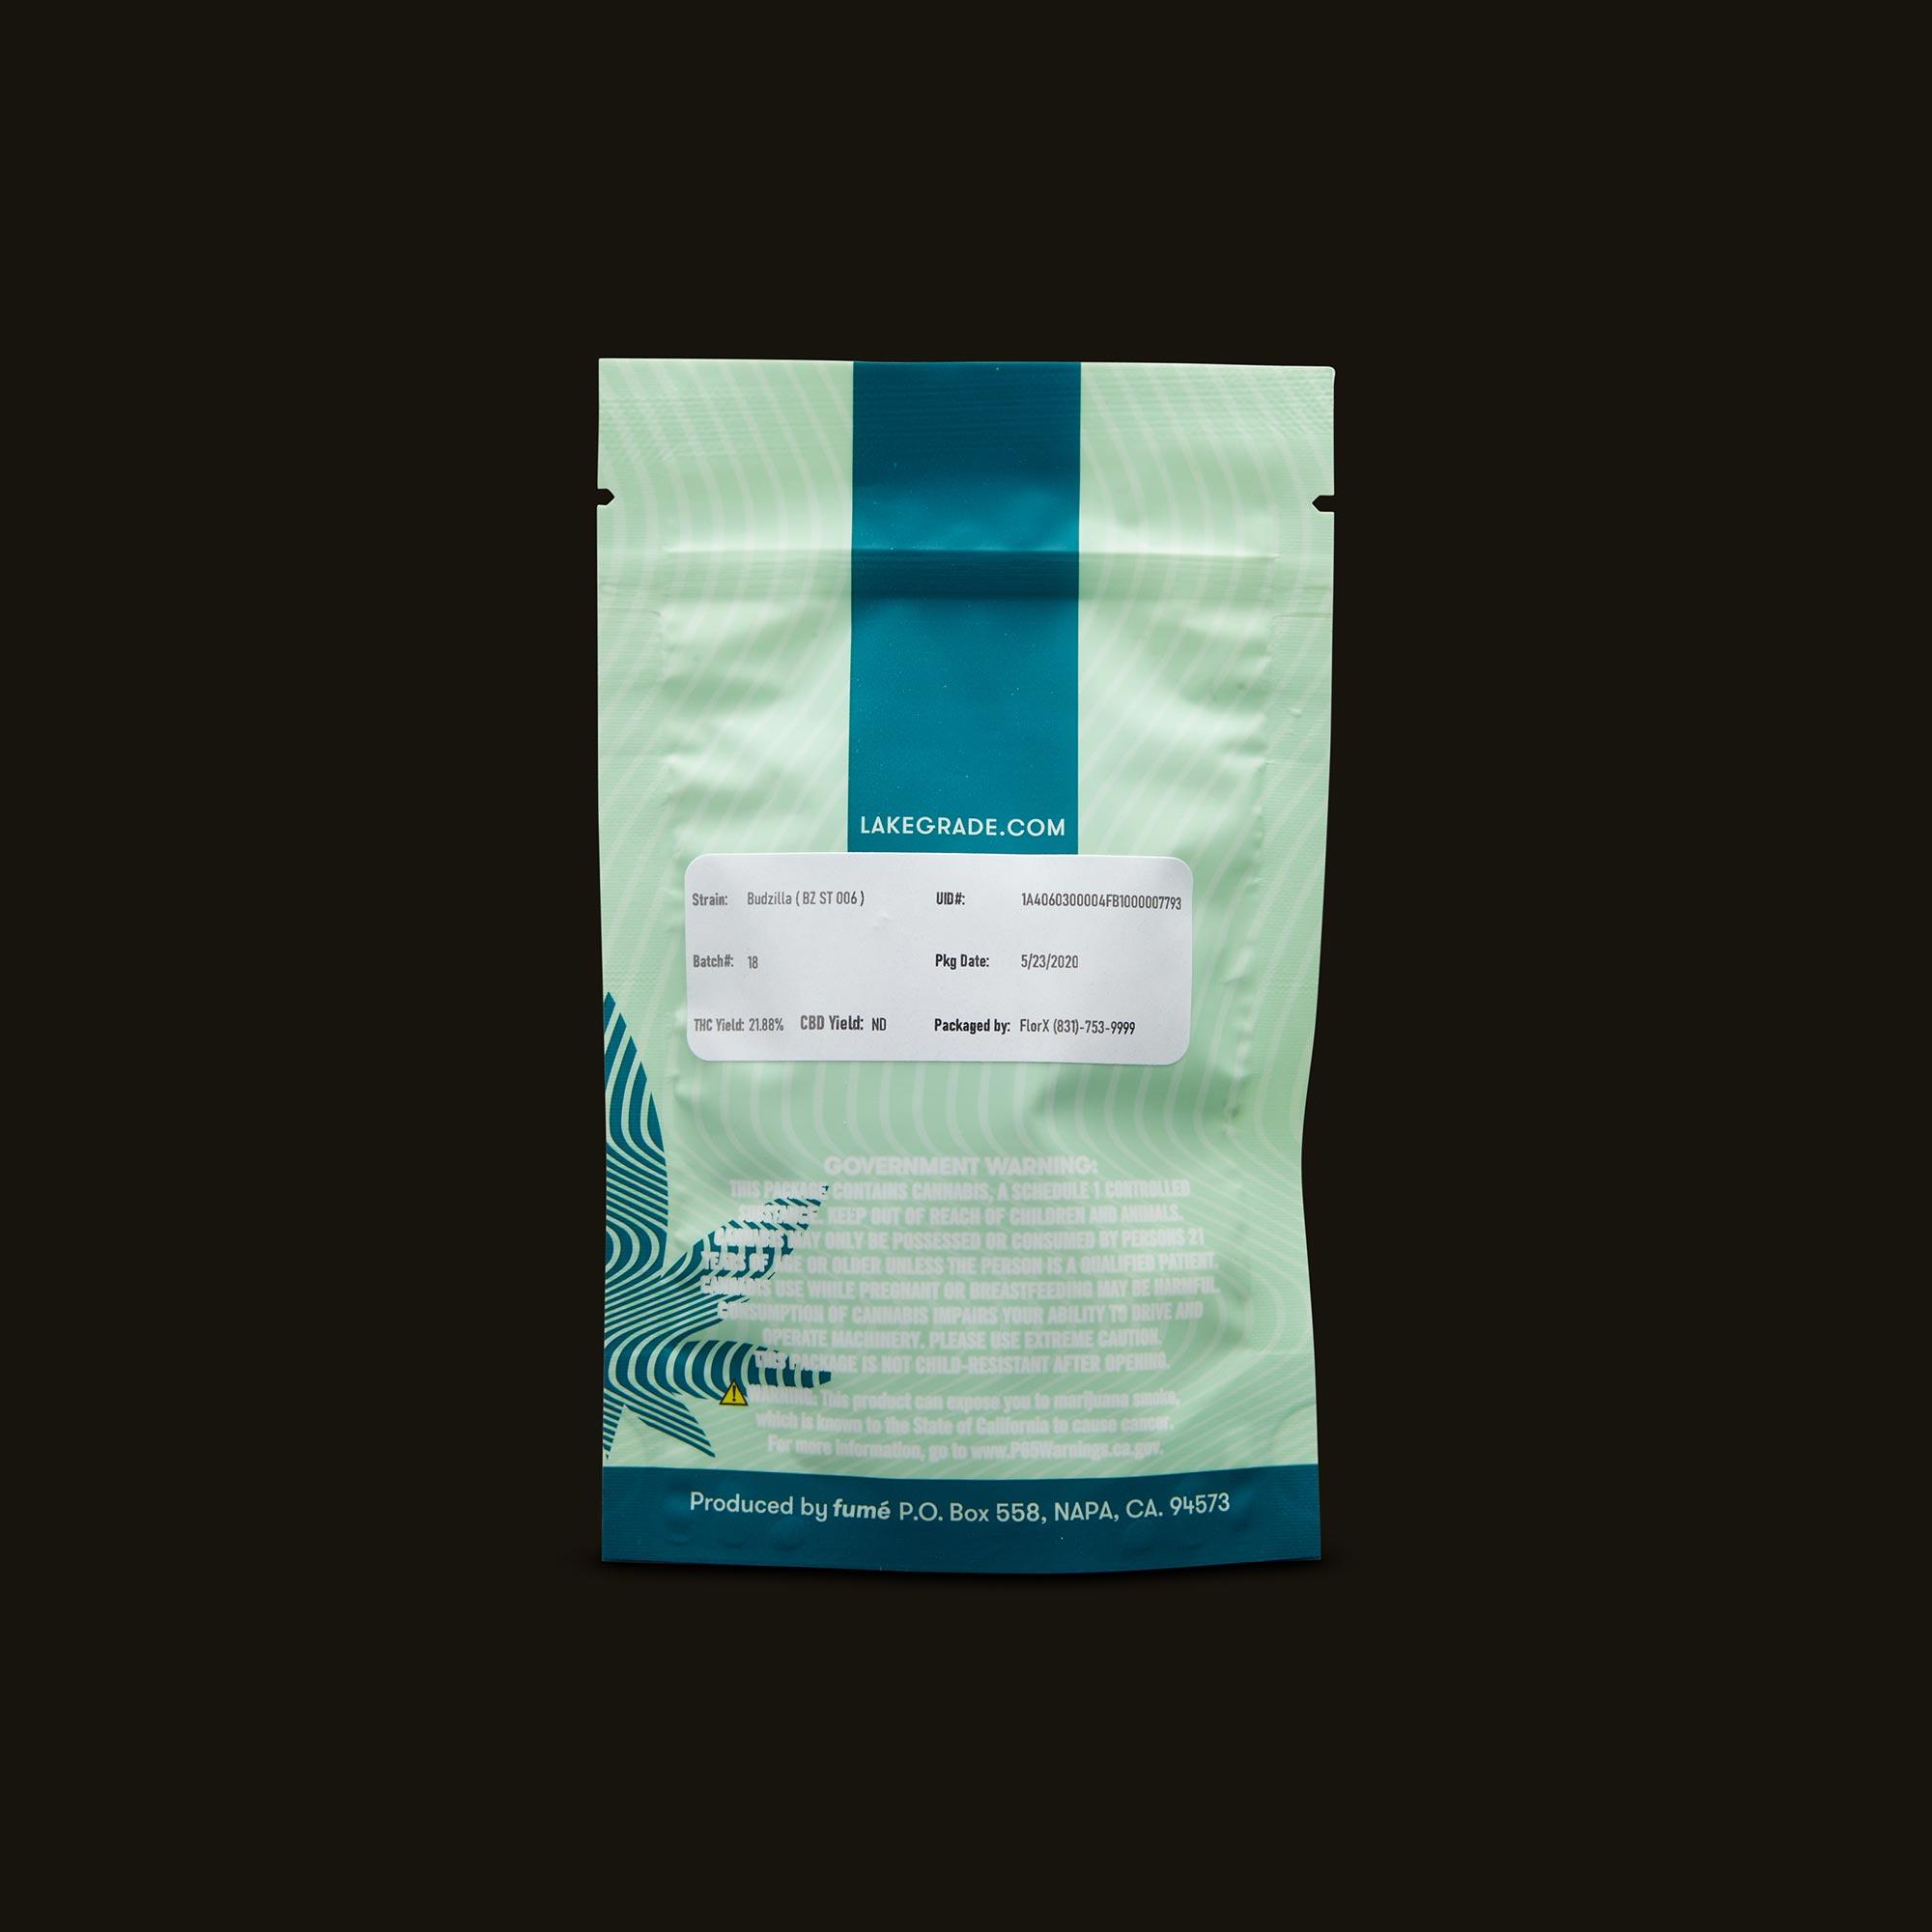 Lakegrade Budzilla Back Packaging